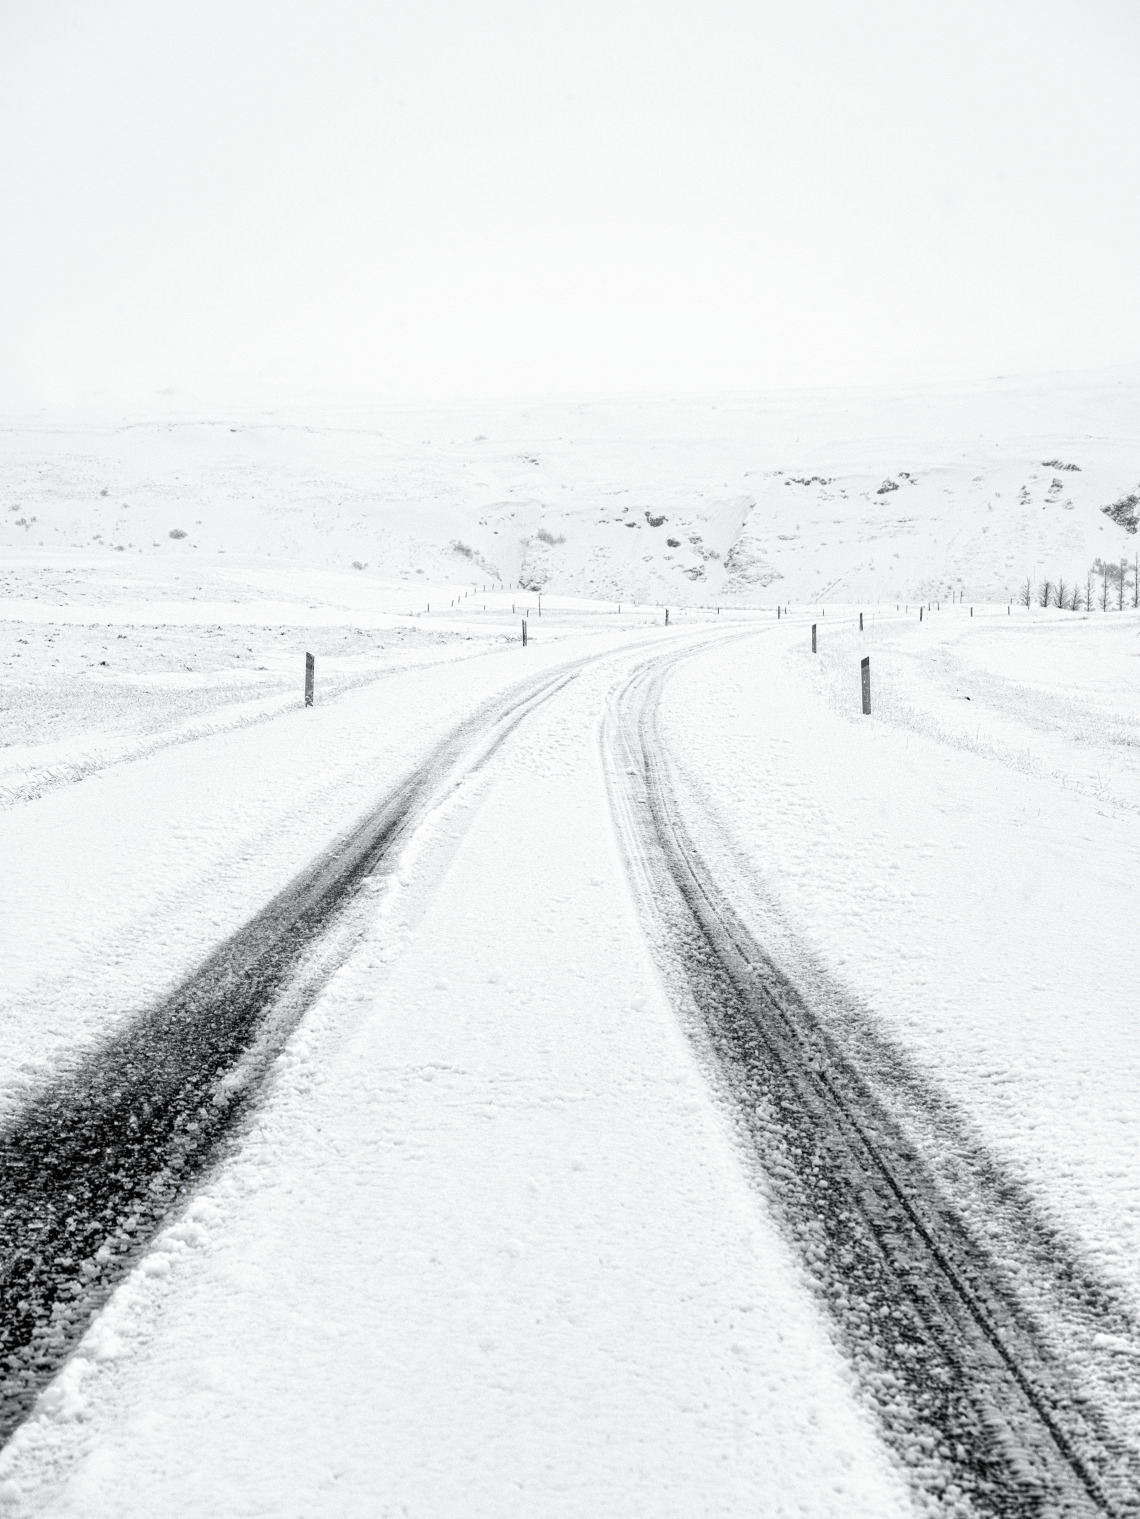 Island Februar 2019 jpegs (17)